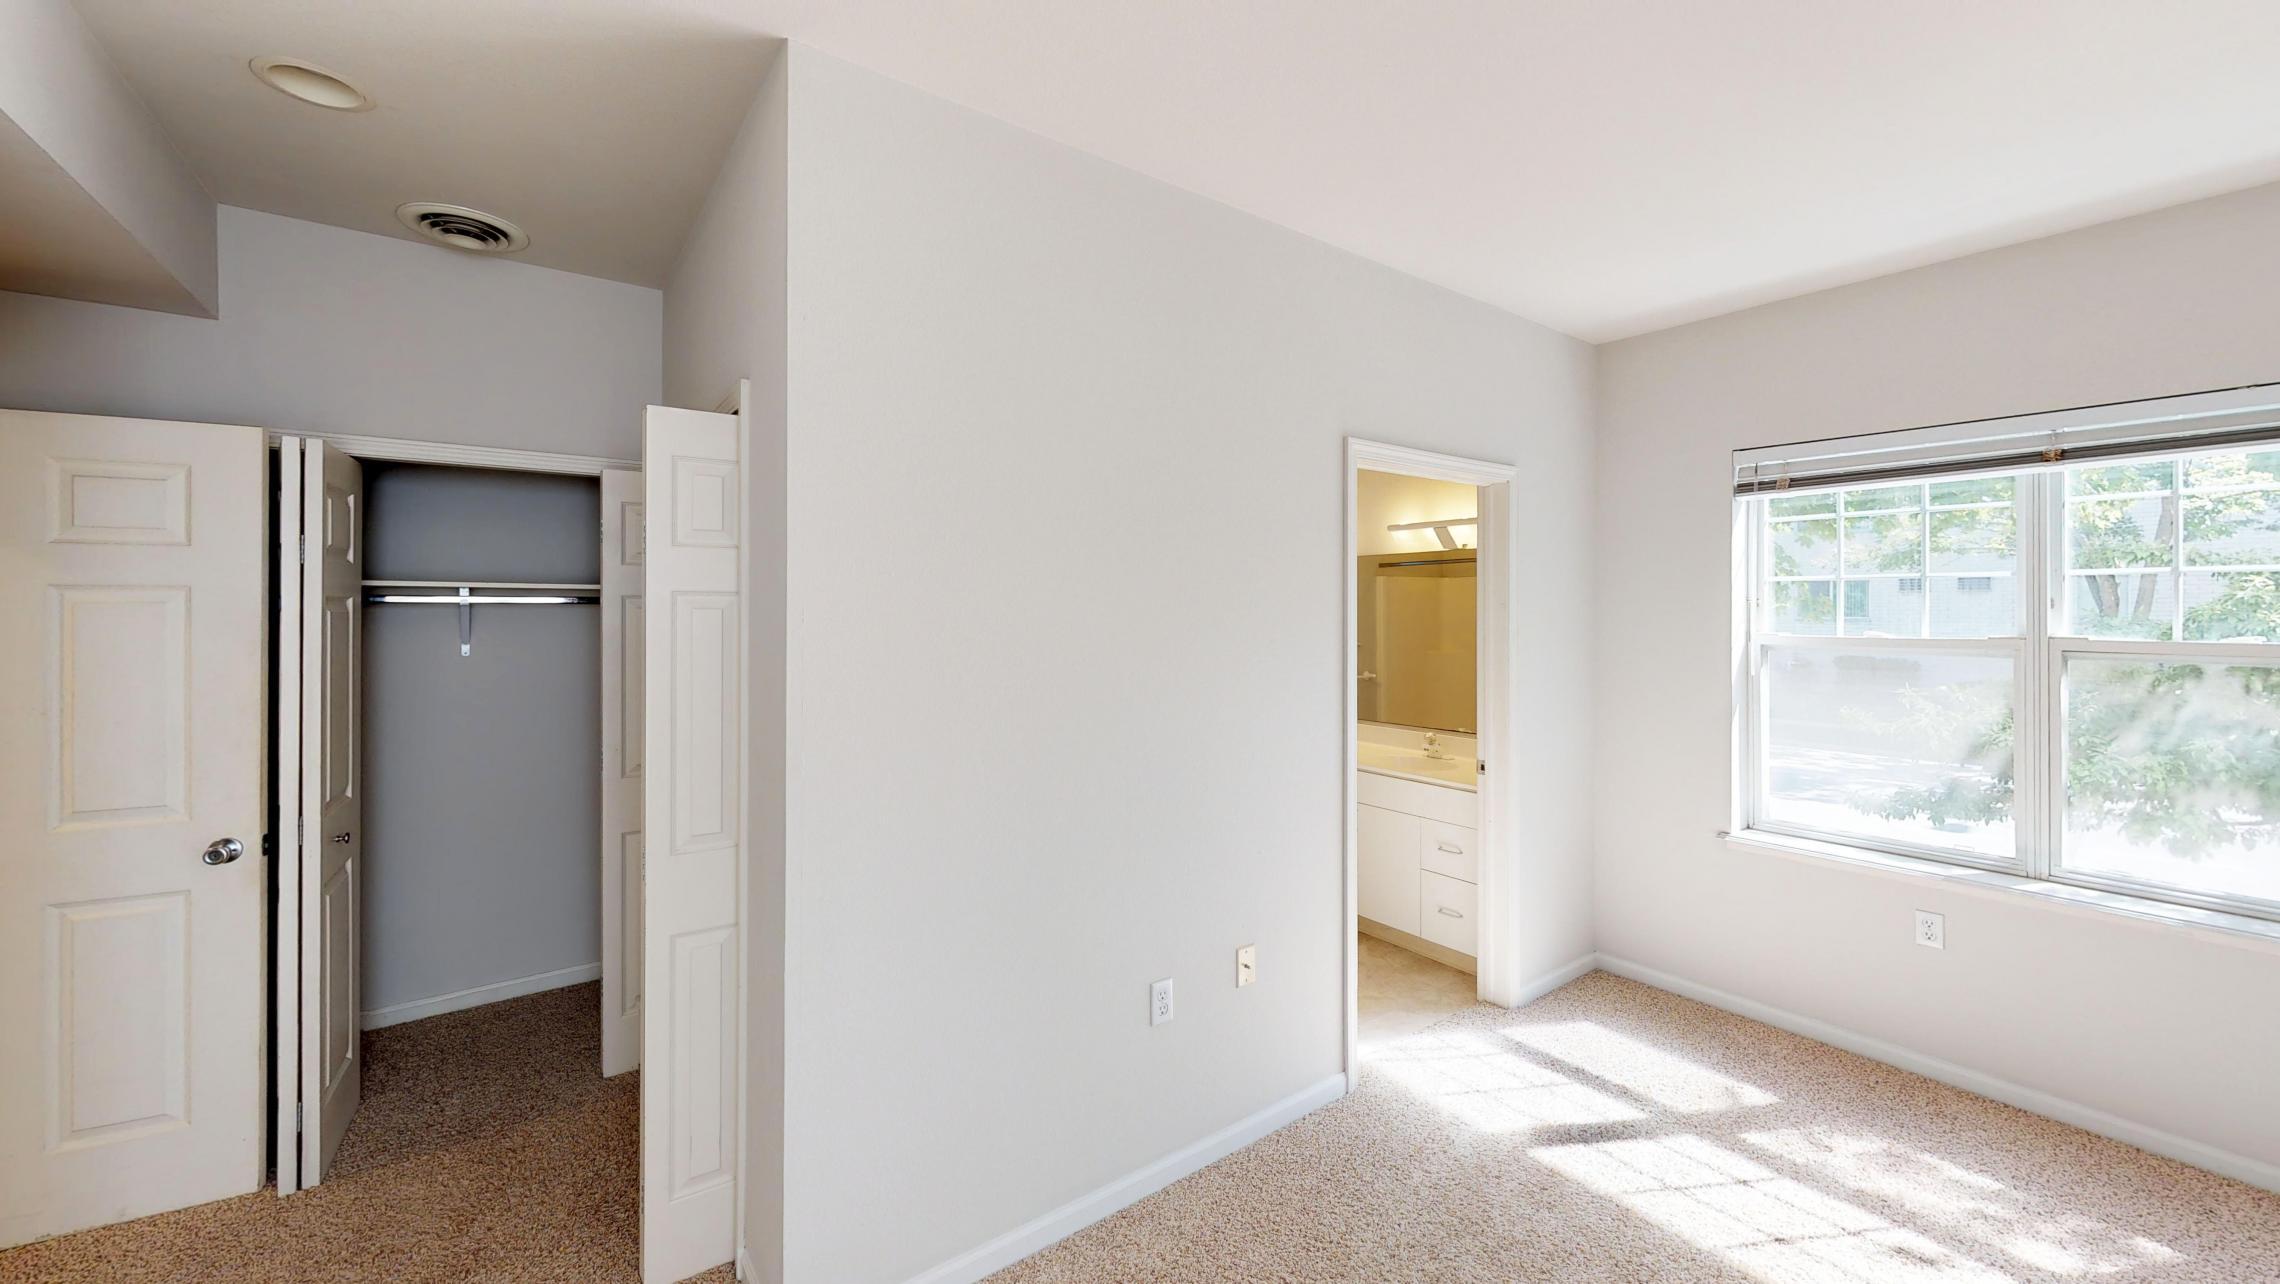 Wilson-Bay-Apartment-112-Two-Bedroom-Downtown-Madison-Master-Bedroom-Closet-Bathroom-Corner-Natural-Light.jpg